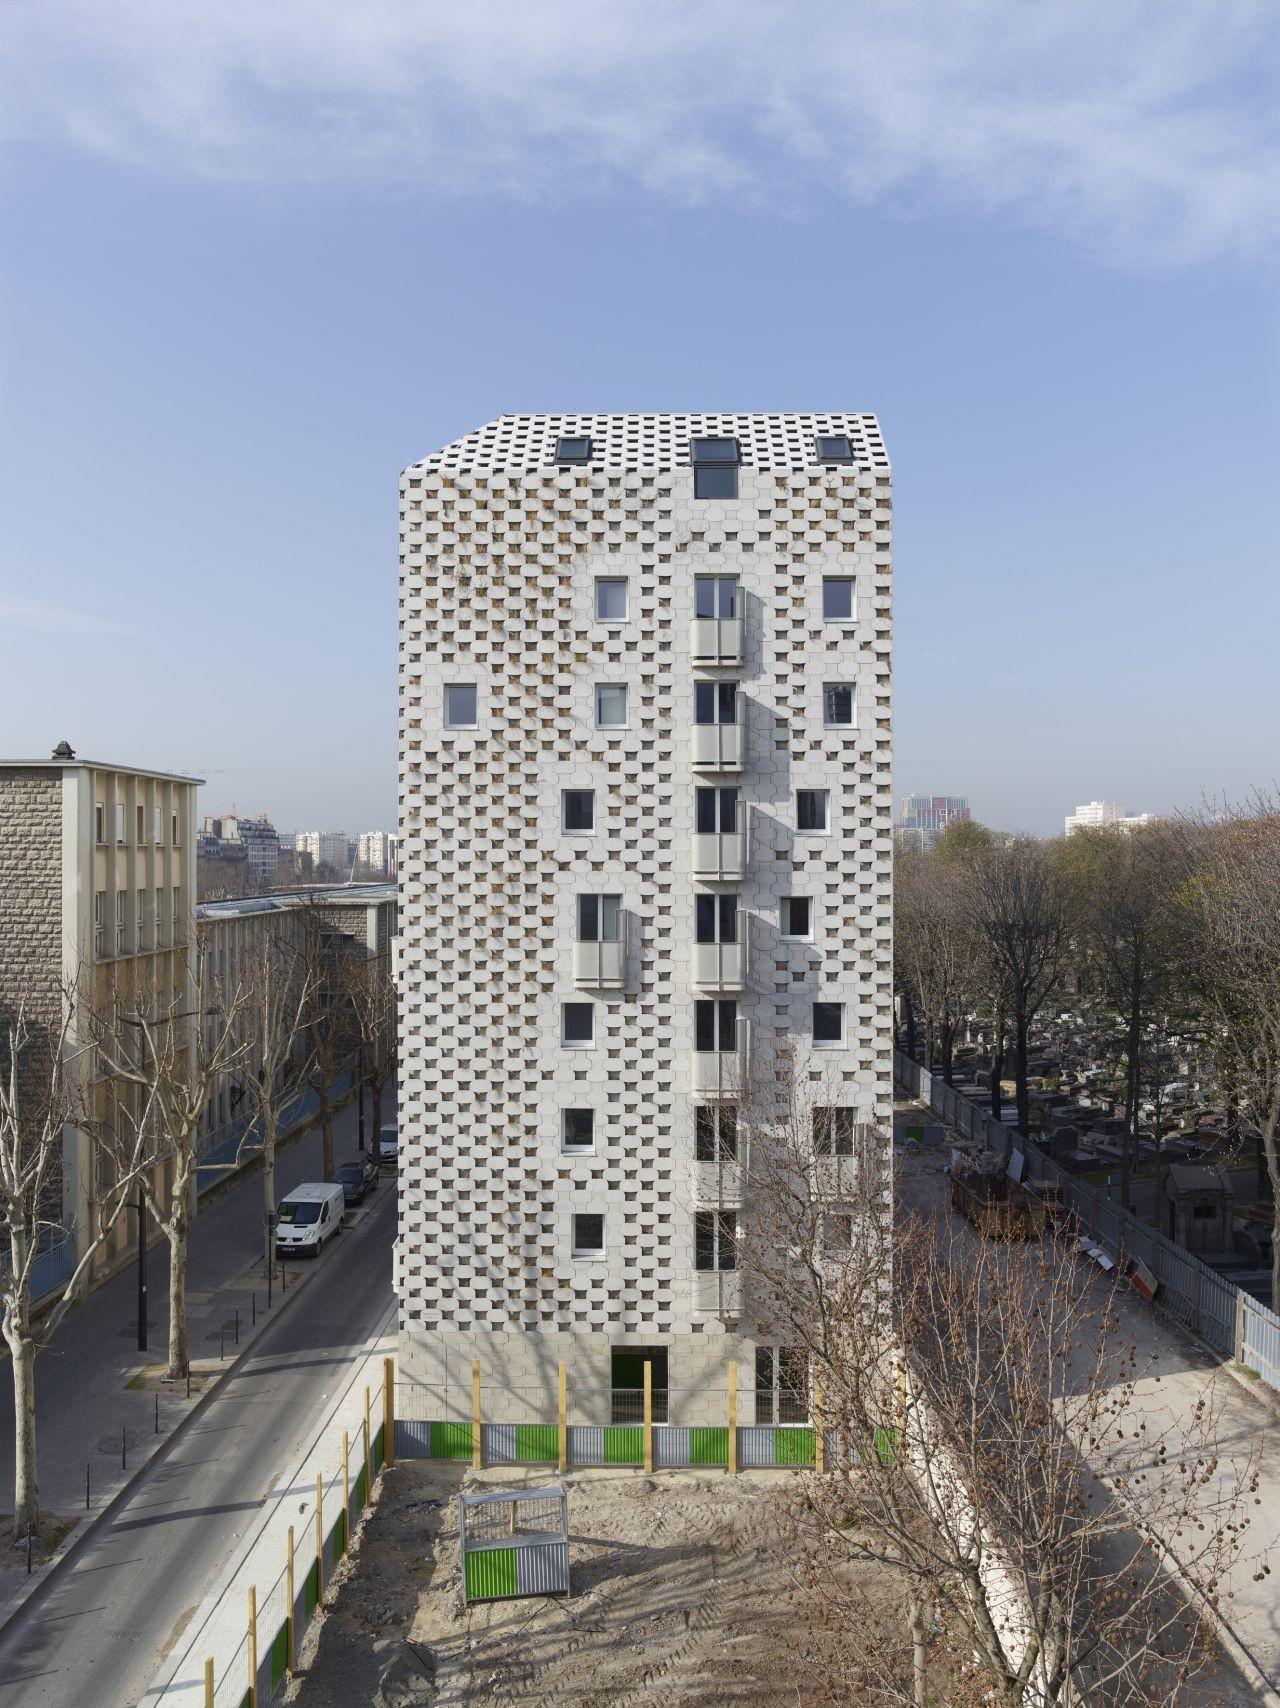 23 Local Authority Housing / Avignon-Clouet Architectes